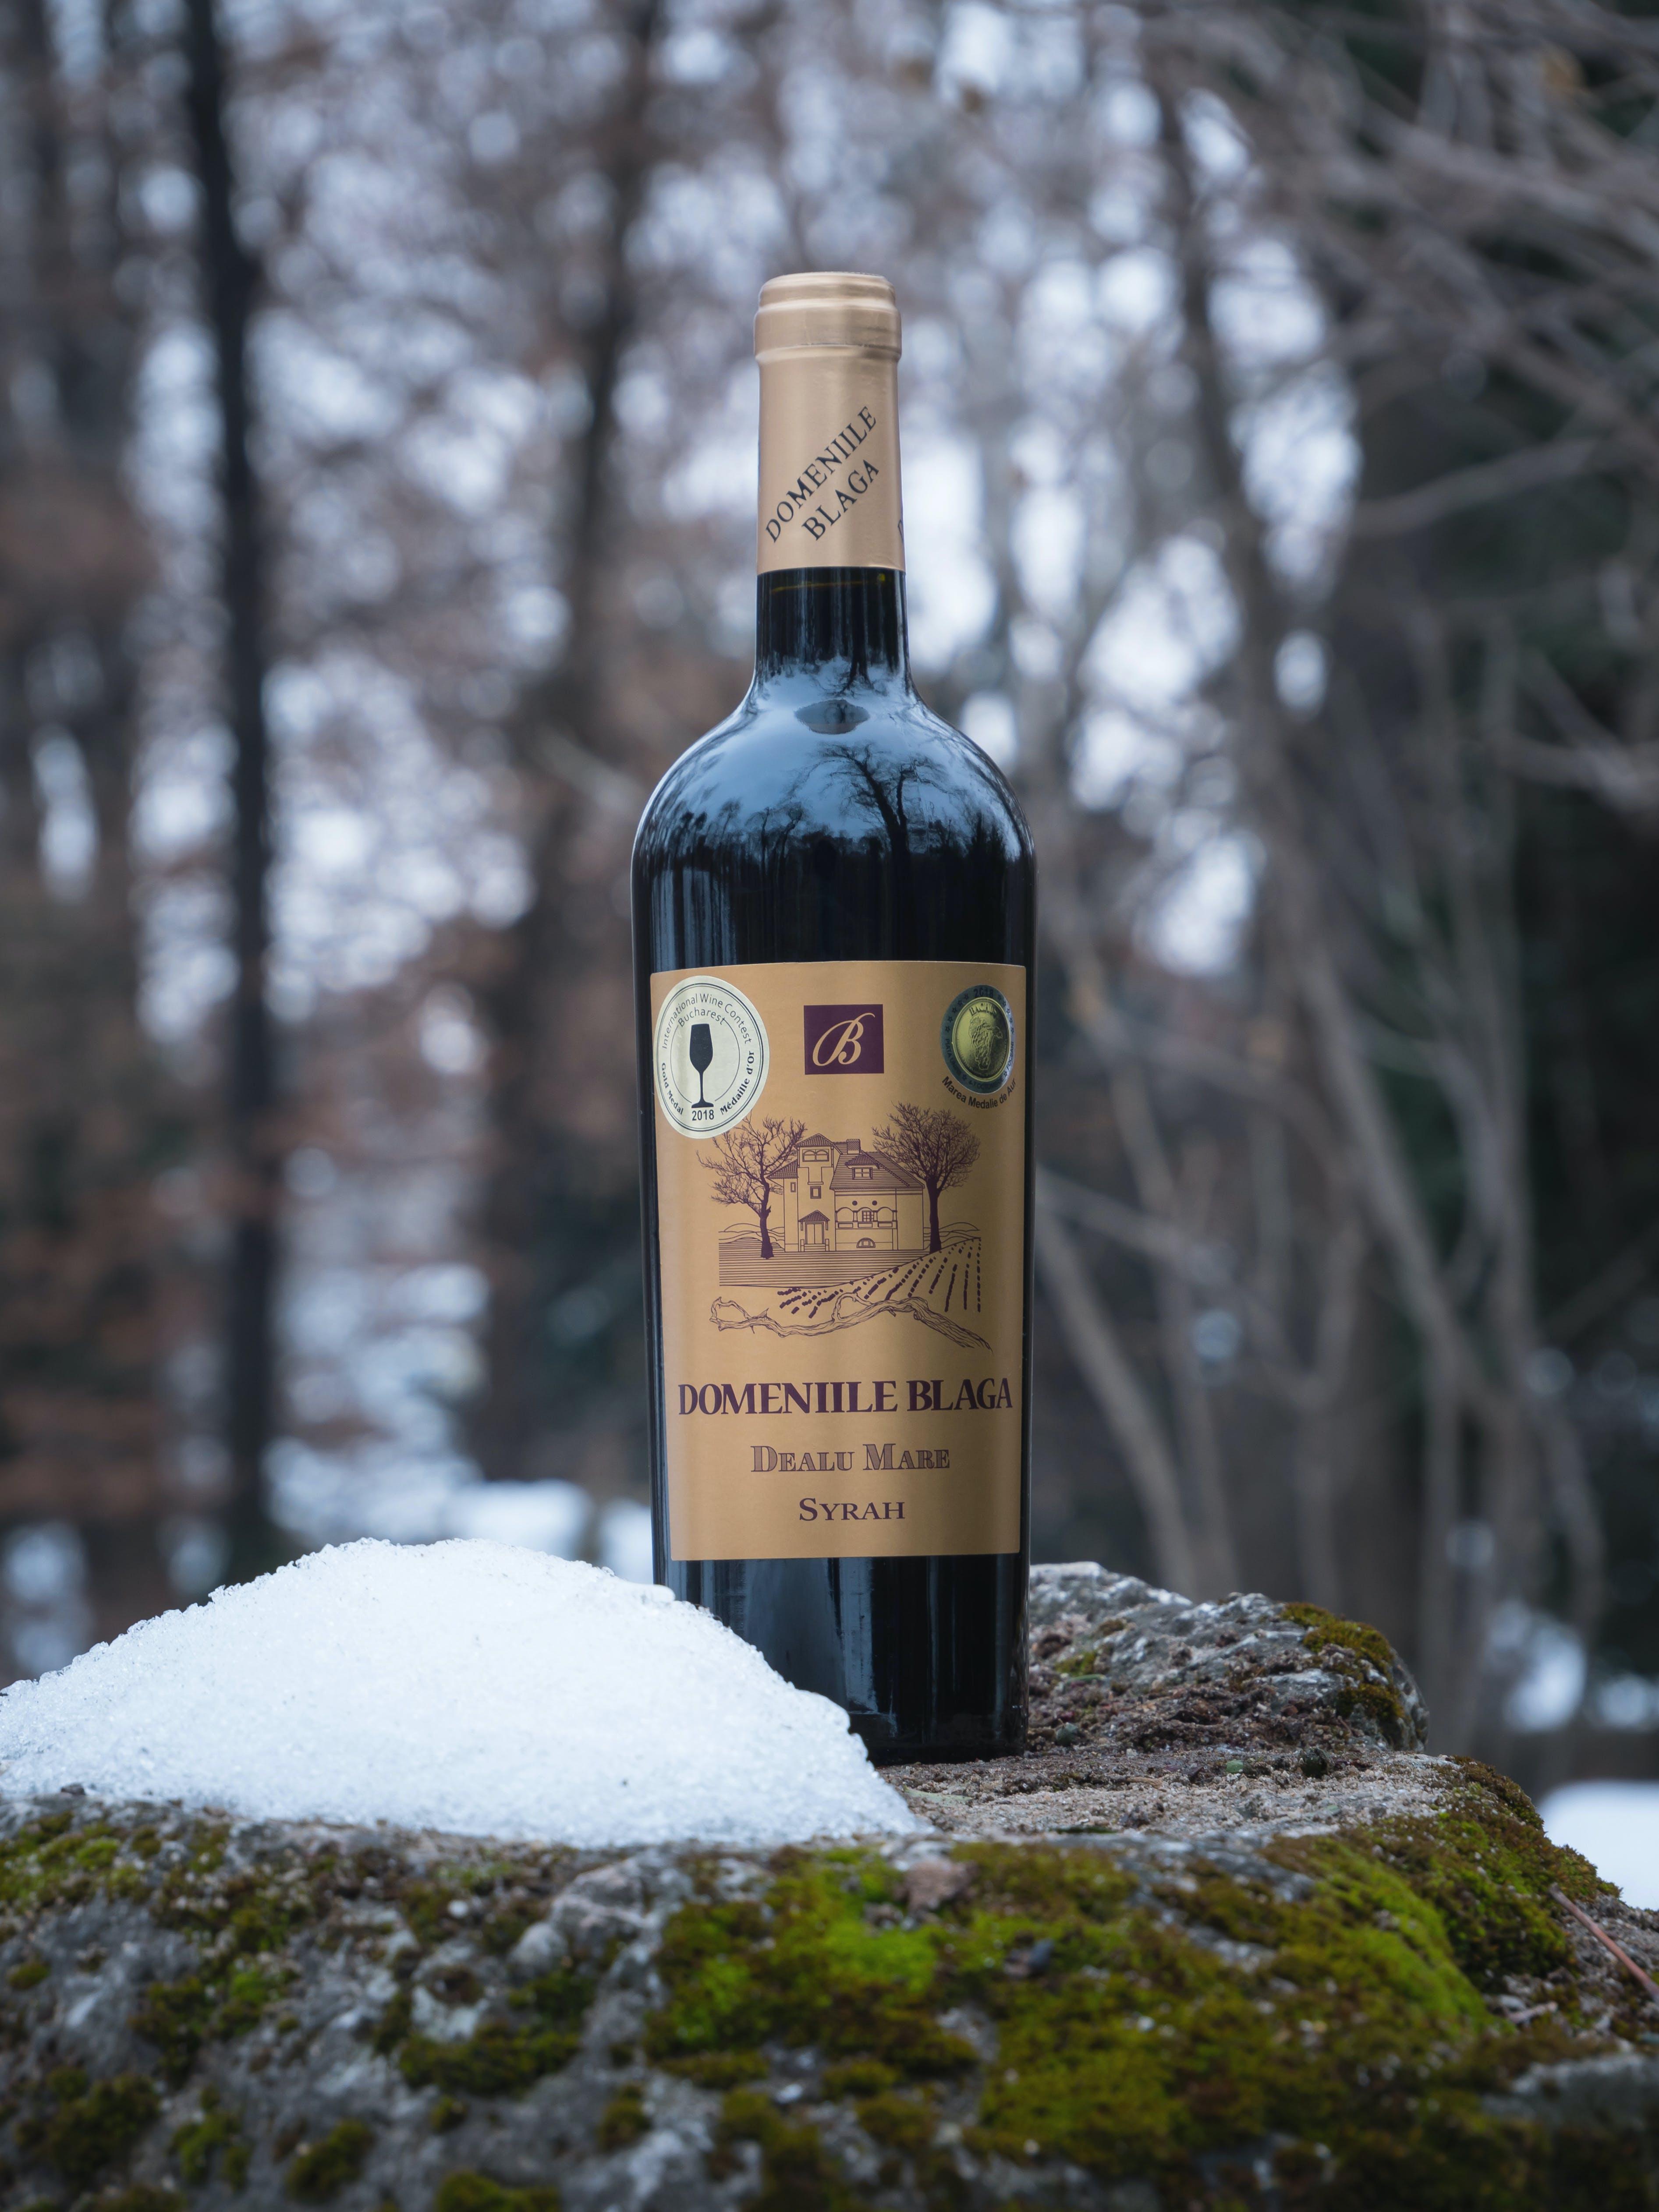 Free stock photo of blaga, bottle, dealu mare, domeniile